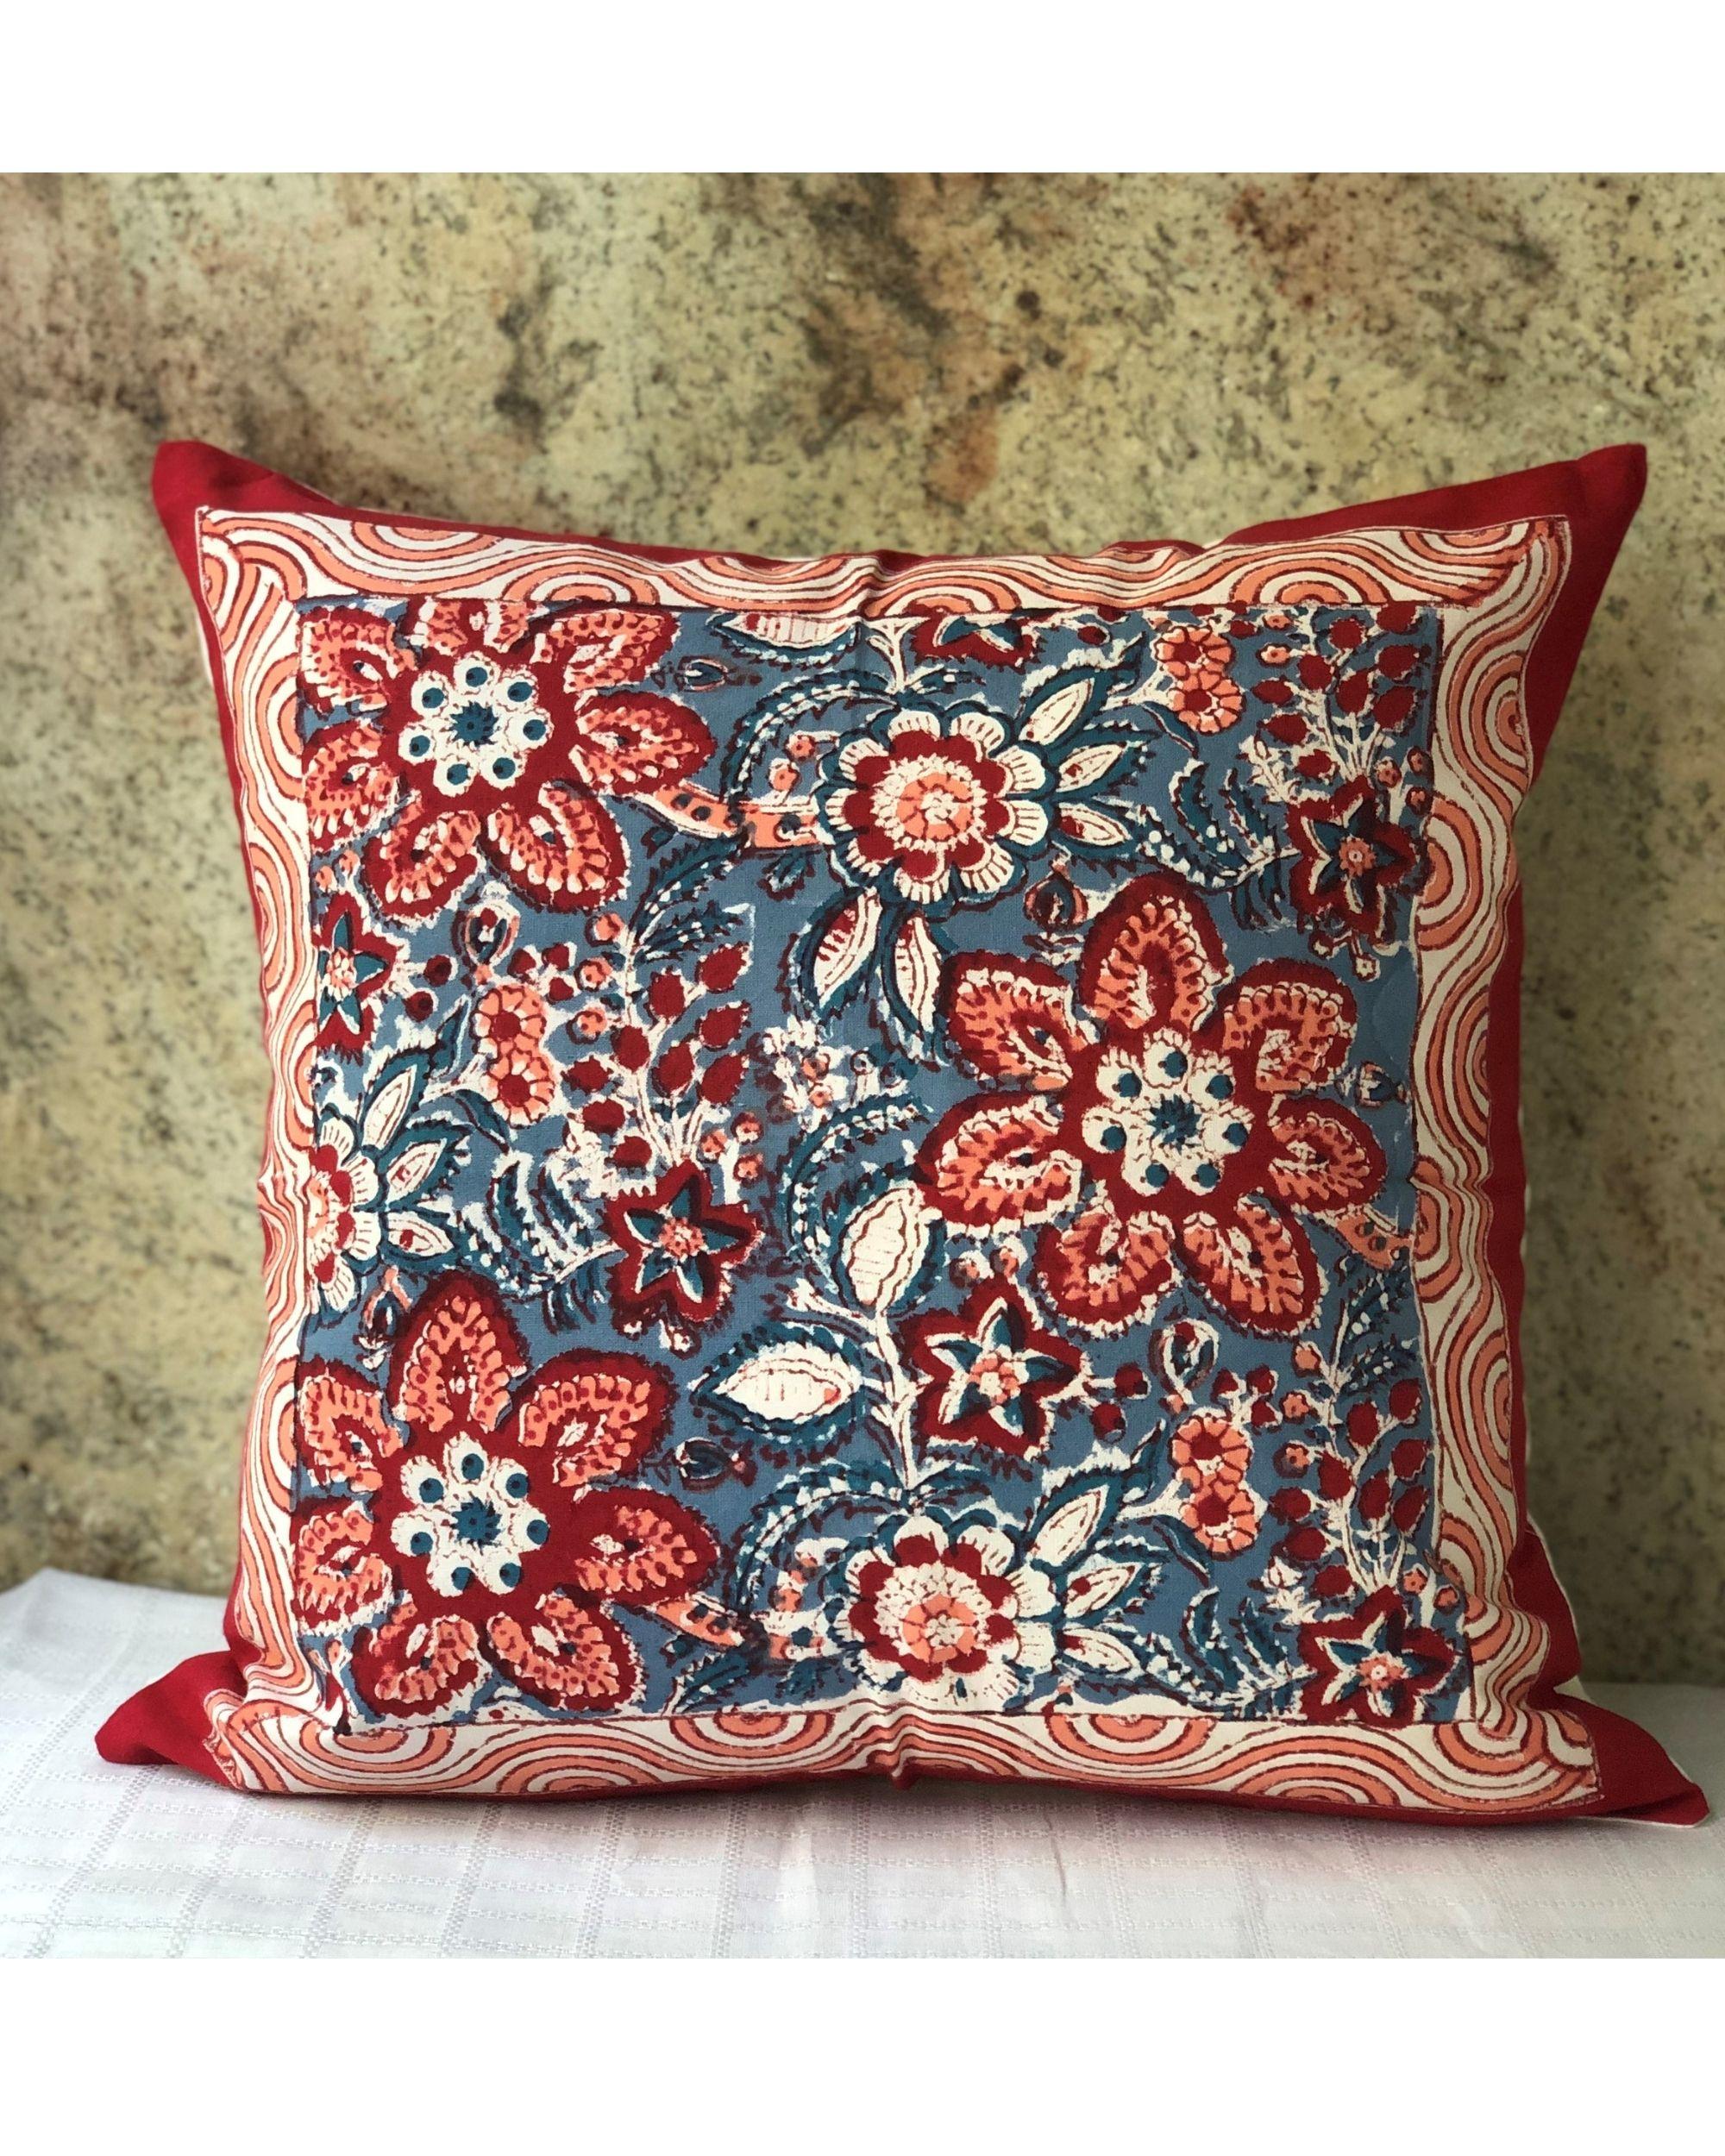 Indigo and red floral sanganeri handblock printed cushion cover - set of two